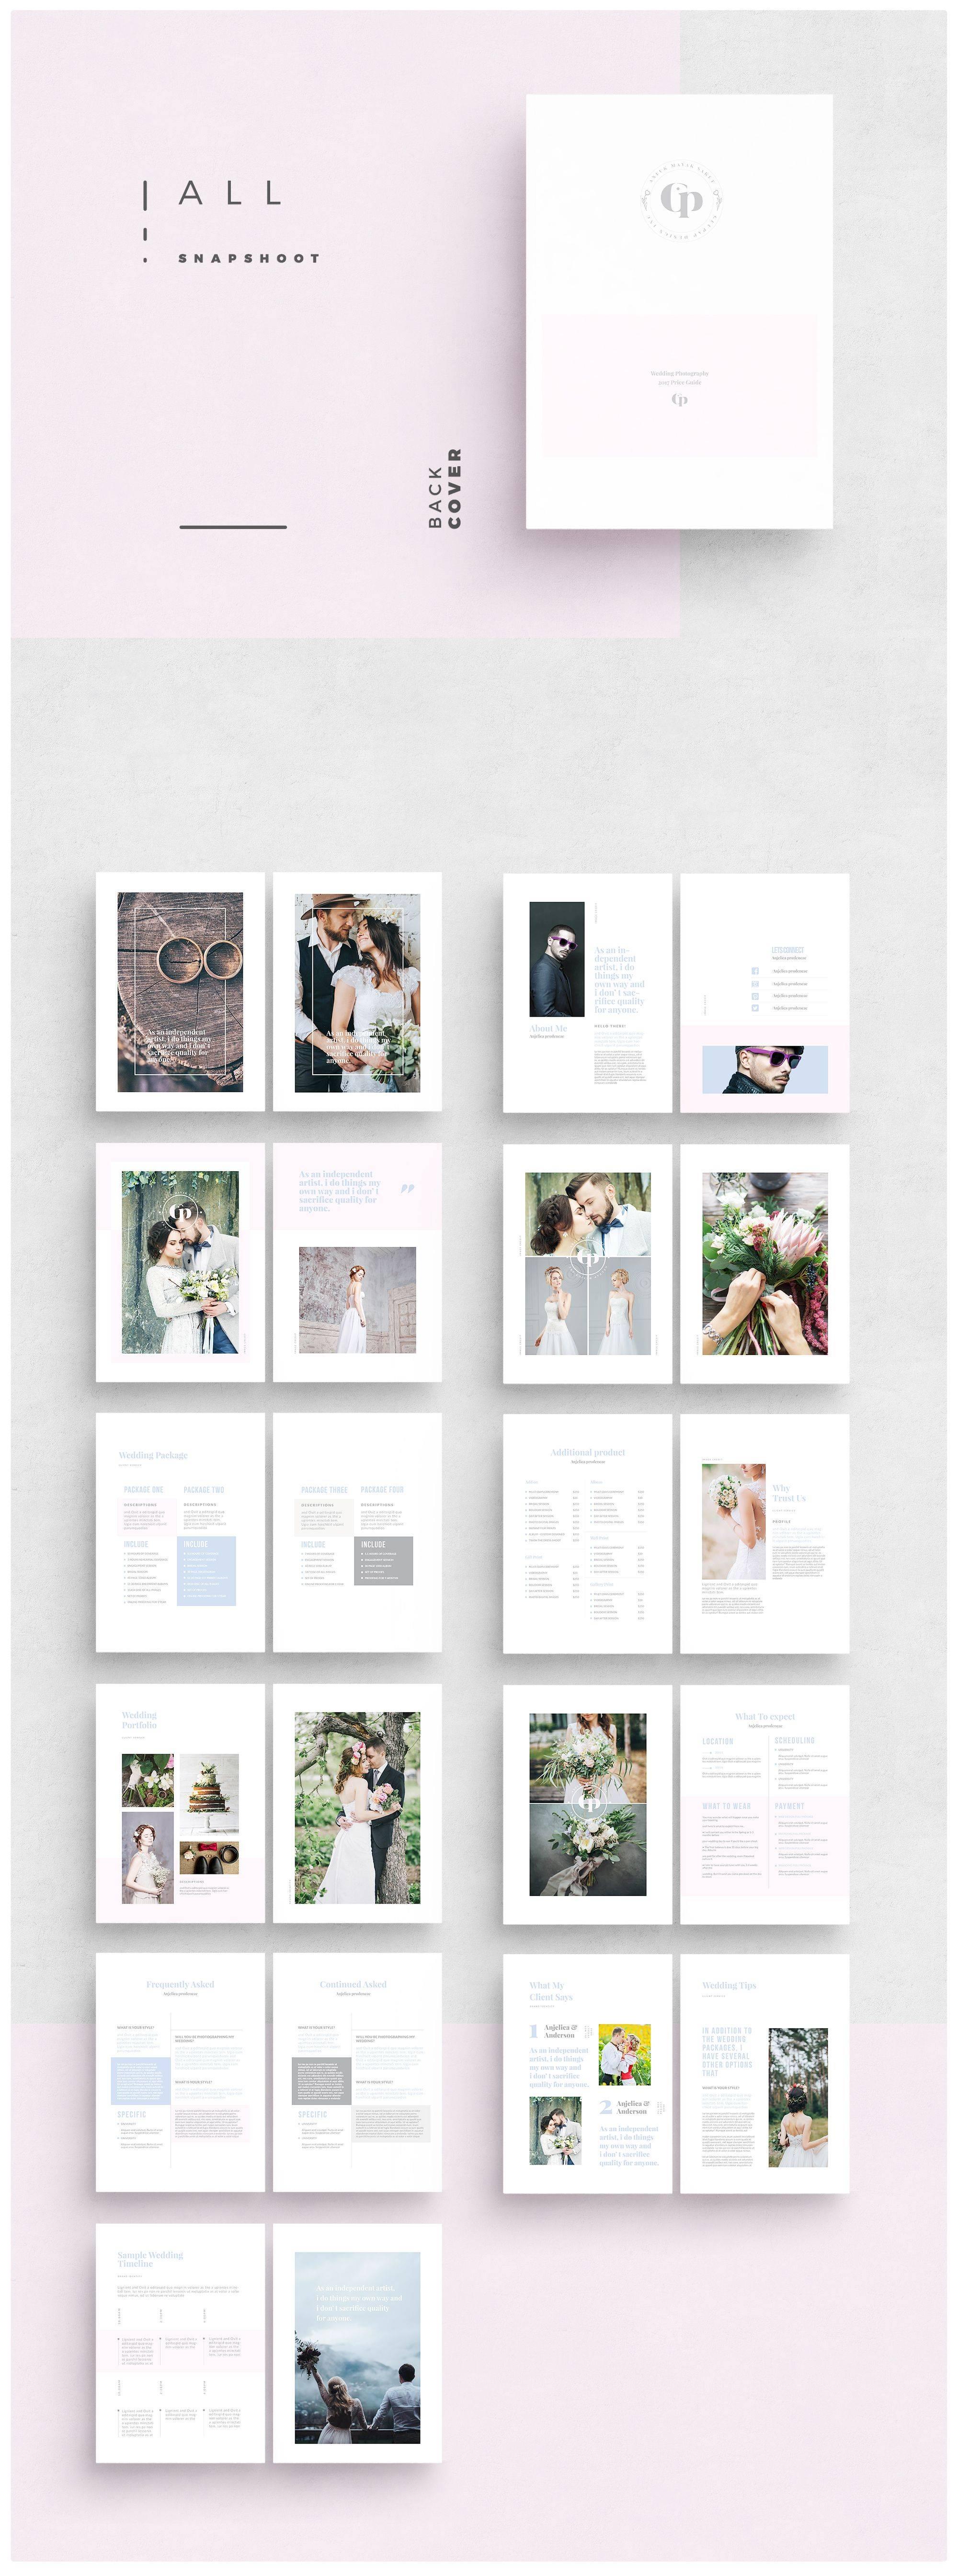 Wedding Photography Marketing Brochure Templates